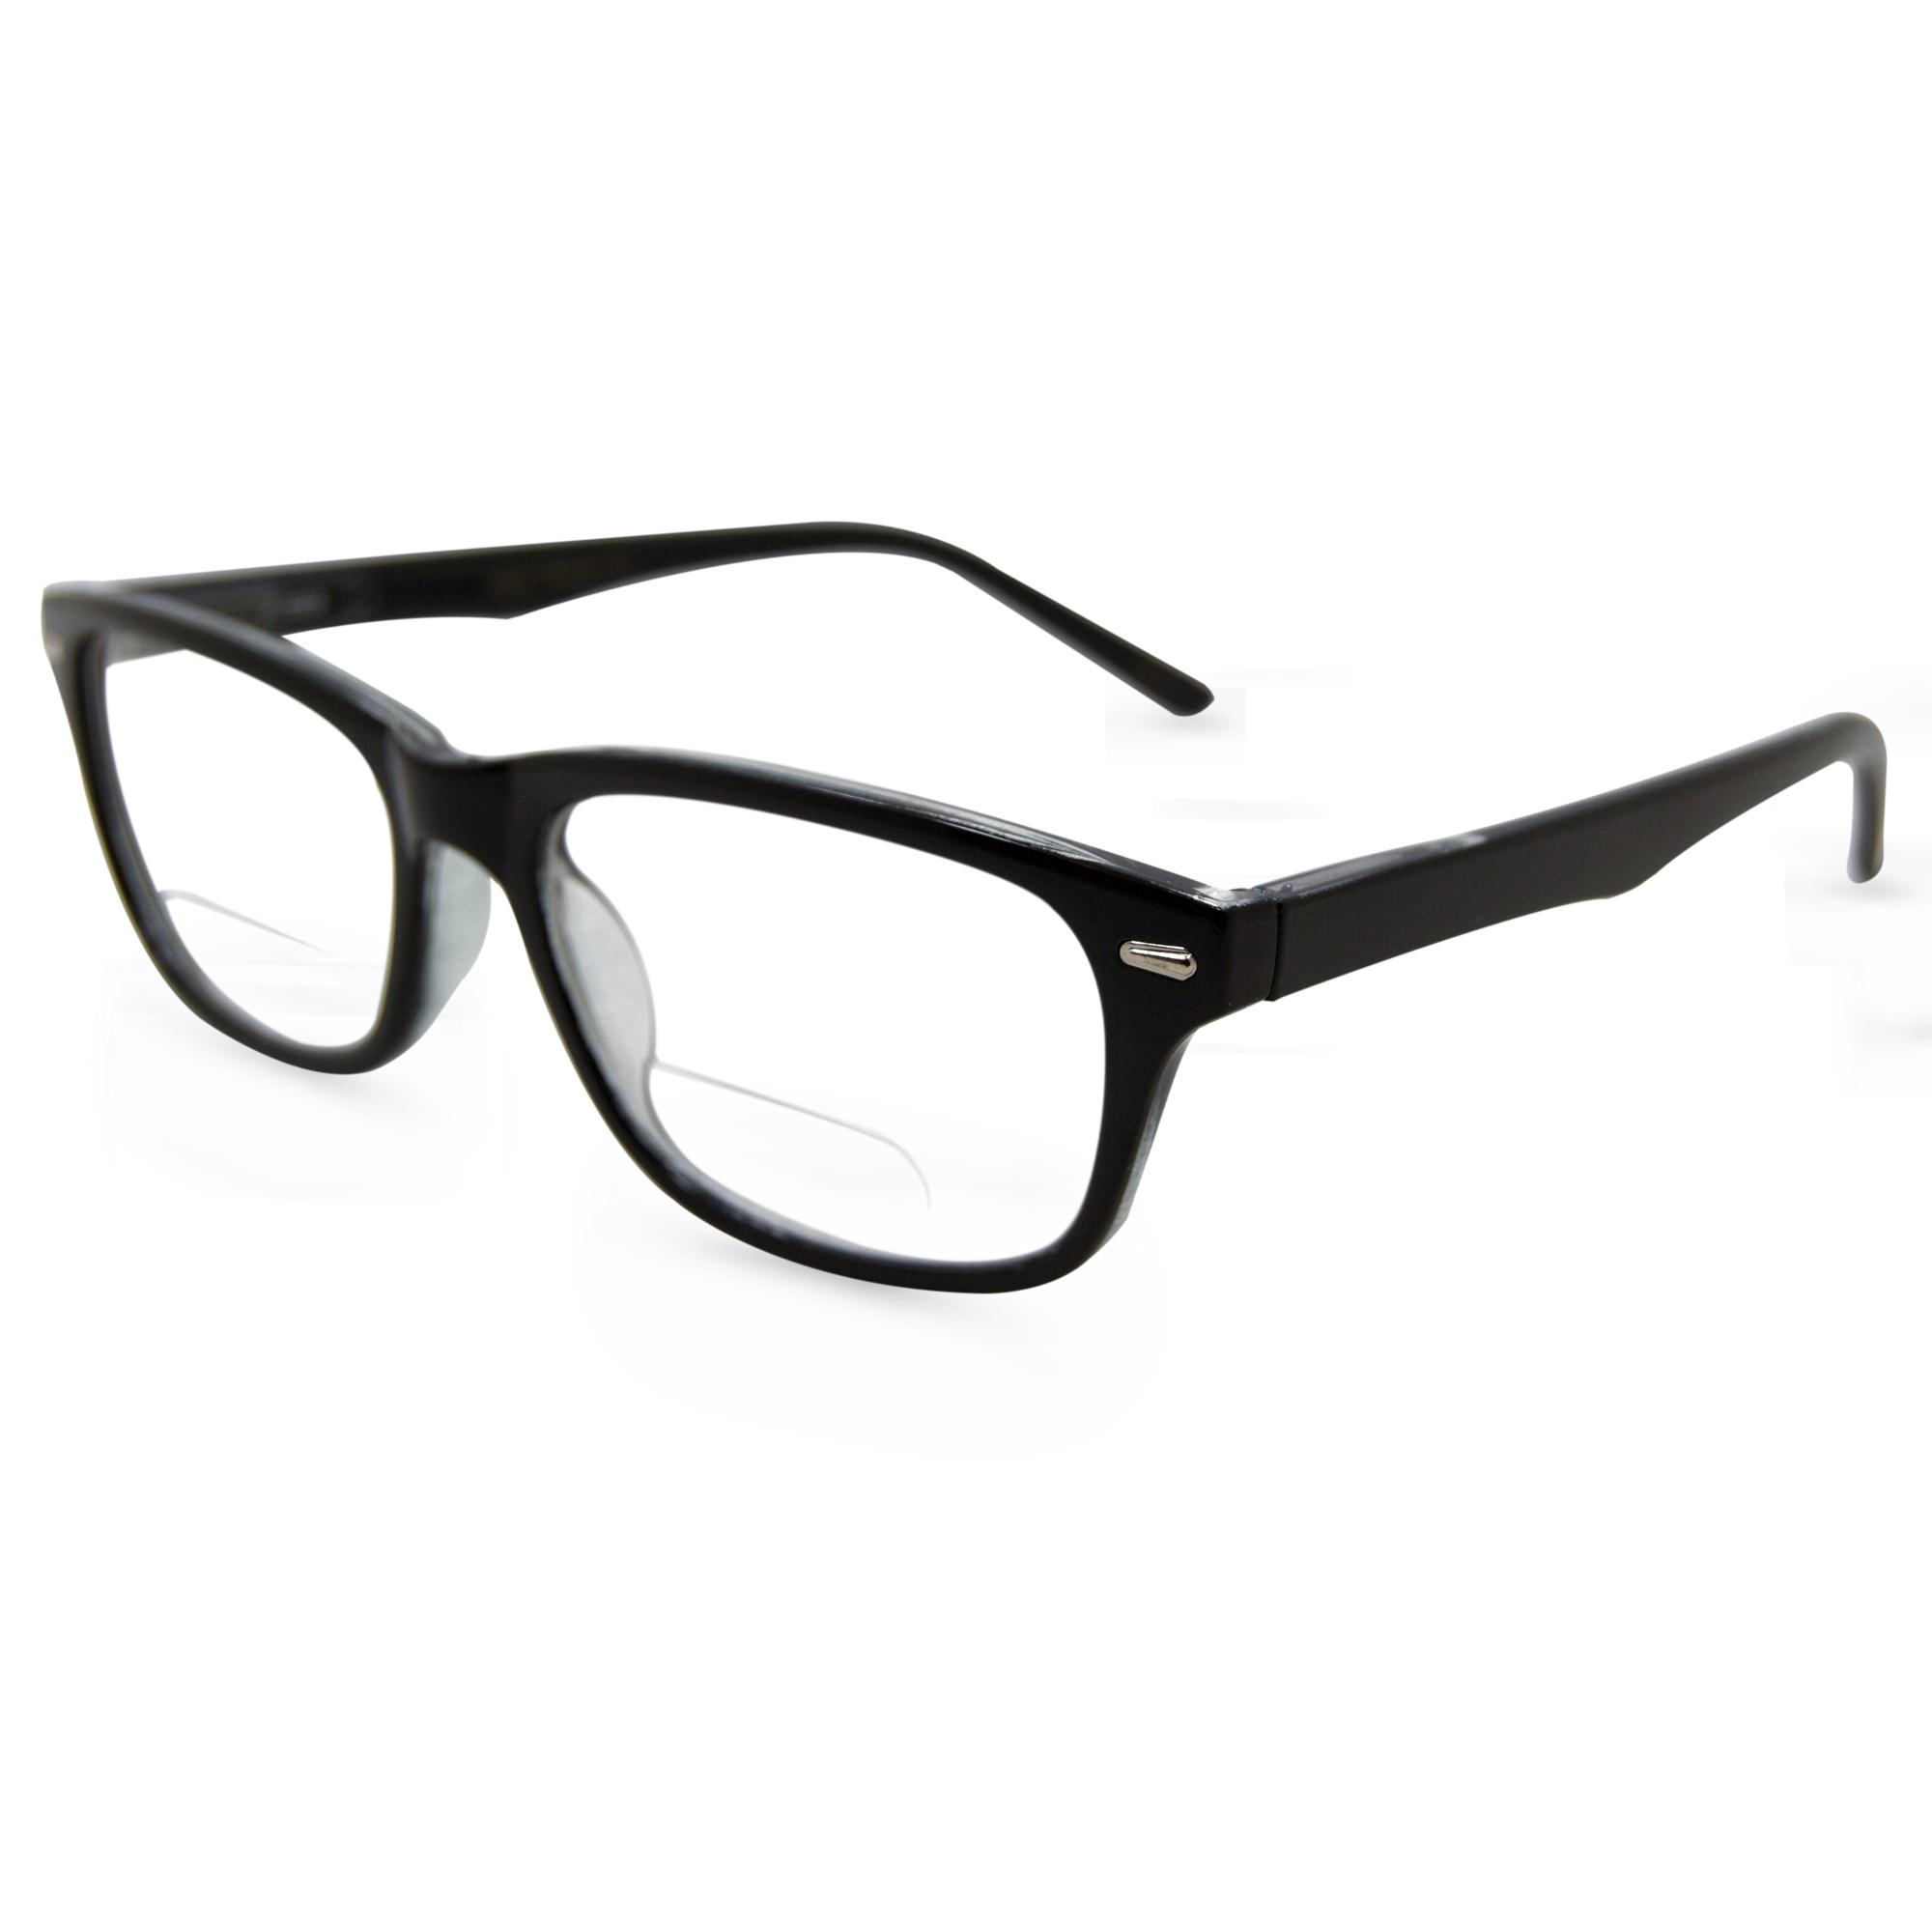 0d84e960e85 In Style Eyes Seymore Retro BiFocal Reading Glasses Black 1.50